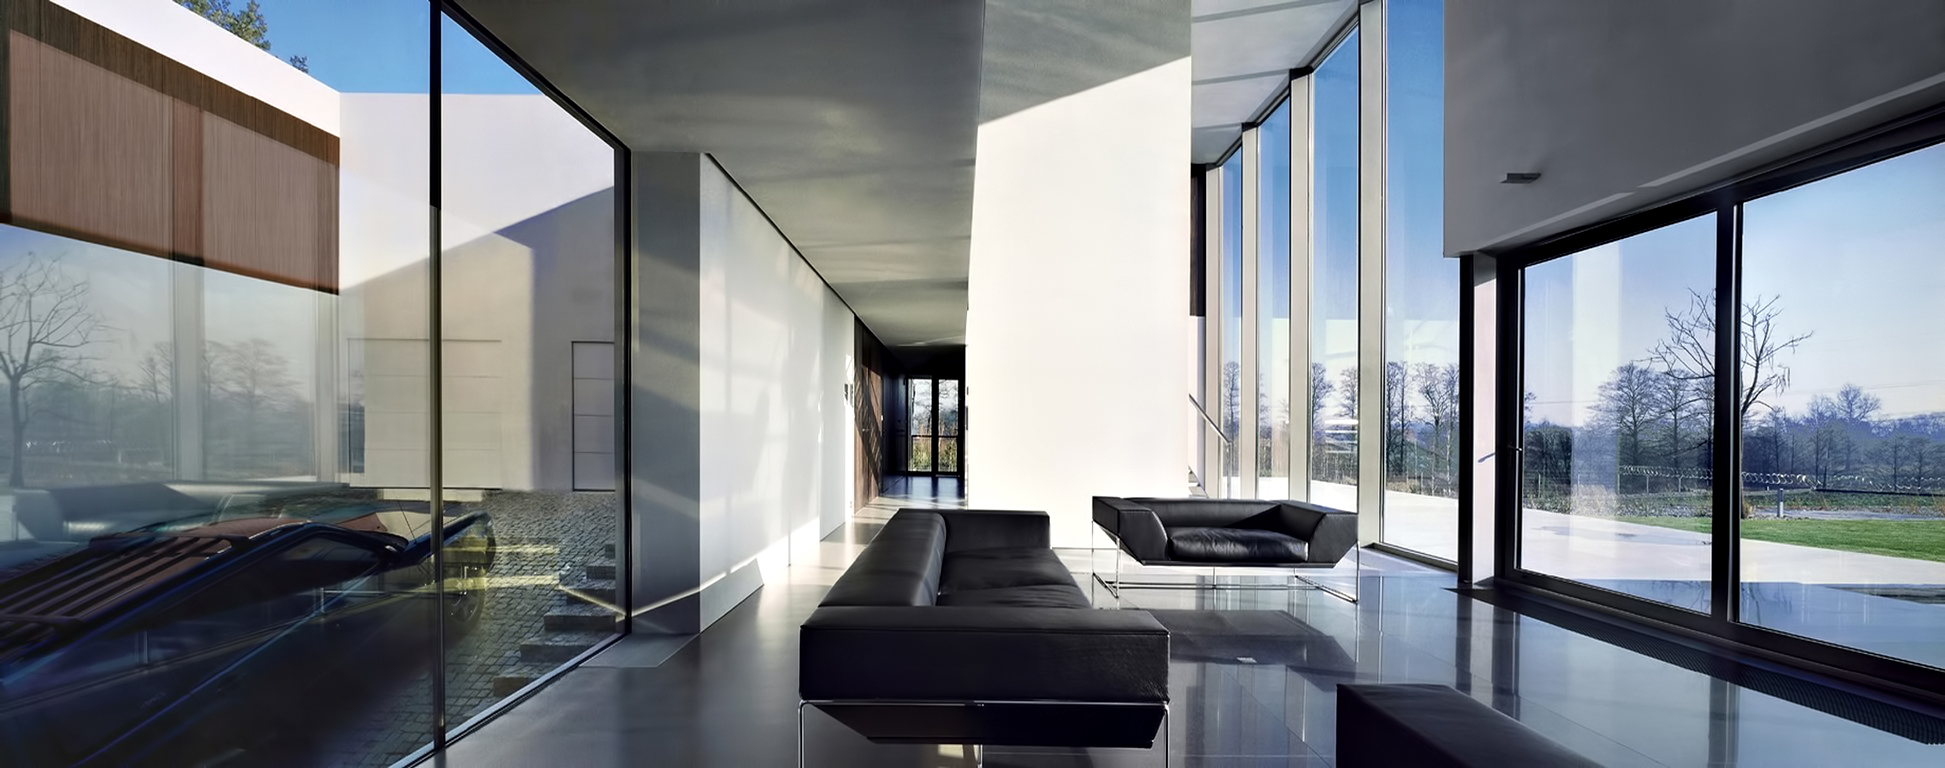 Aatrial House Luxury Residence - Opole, Poland